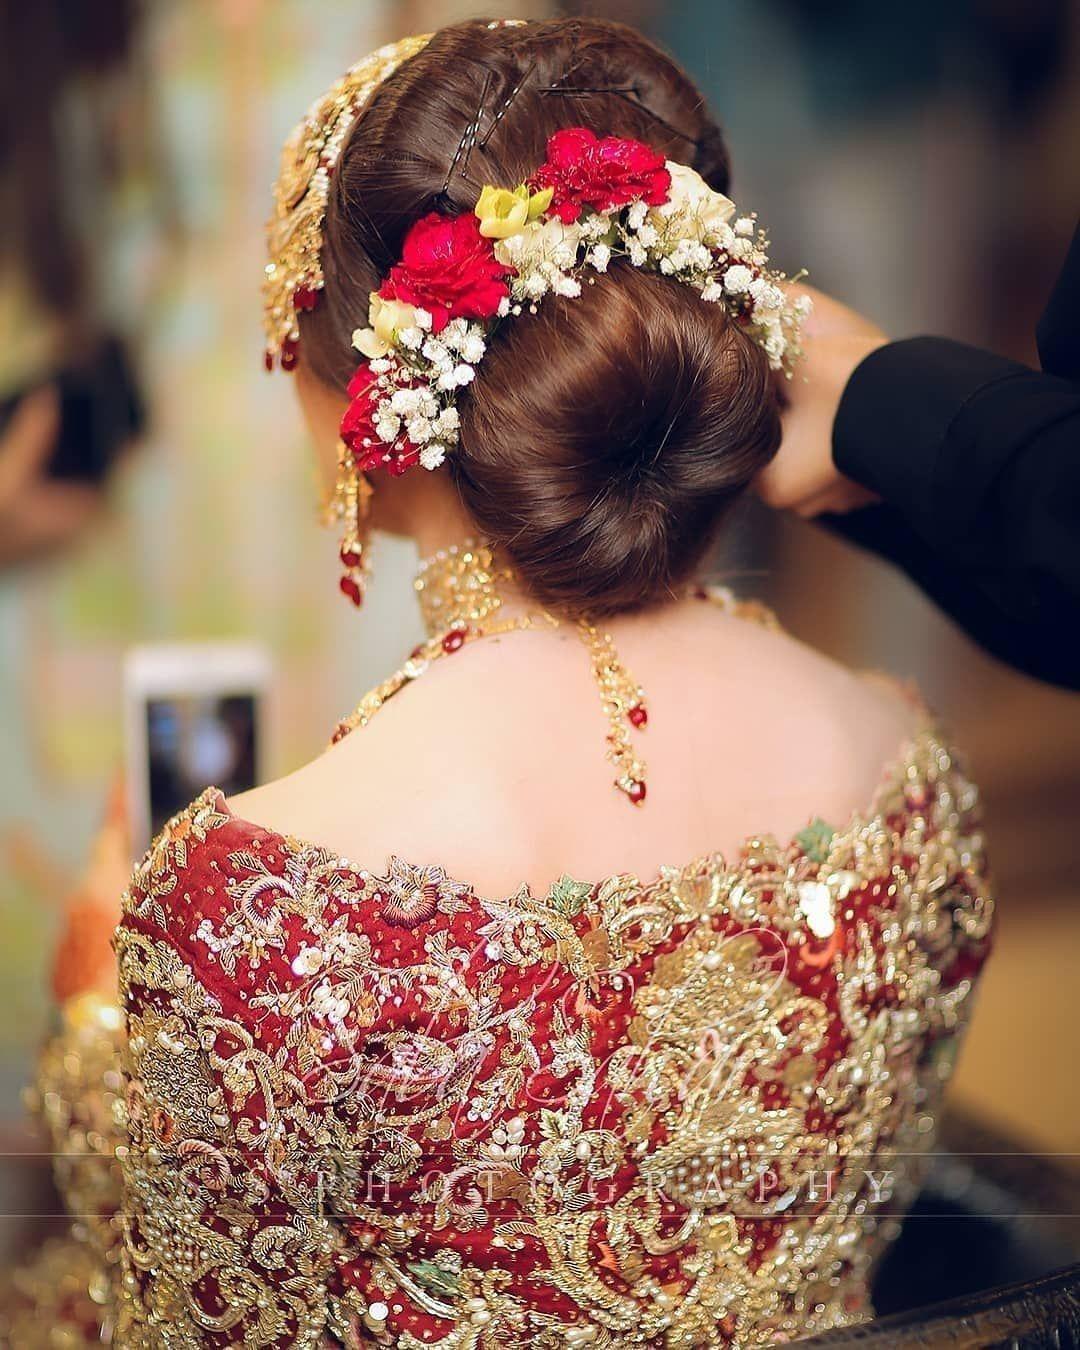 Pin By Rabia Tariq On Weddings In 2020 Pakistani Bridal Makeup Indian Bridal Hairstyles Red Bridal Dress